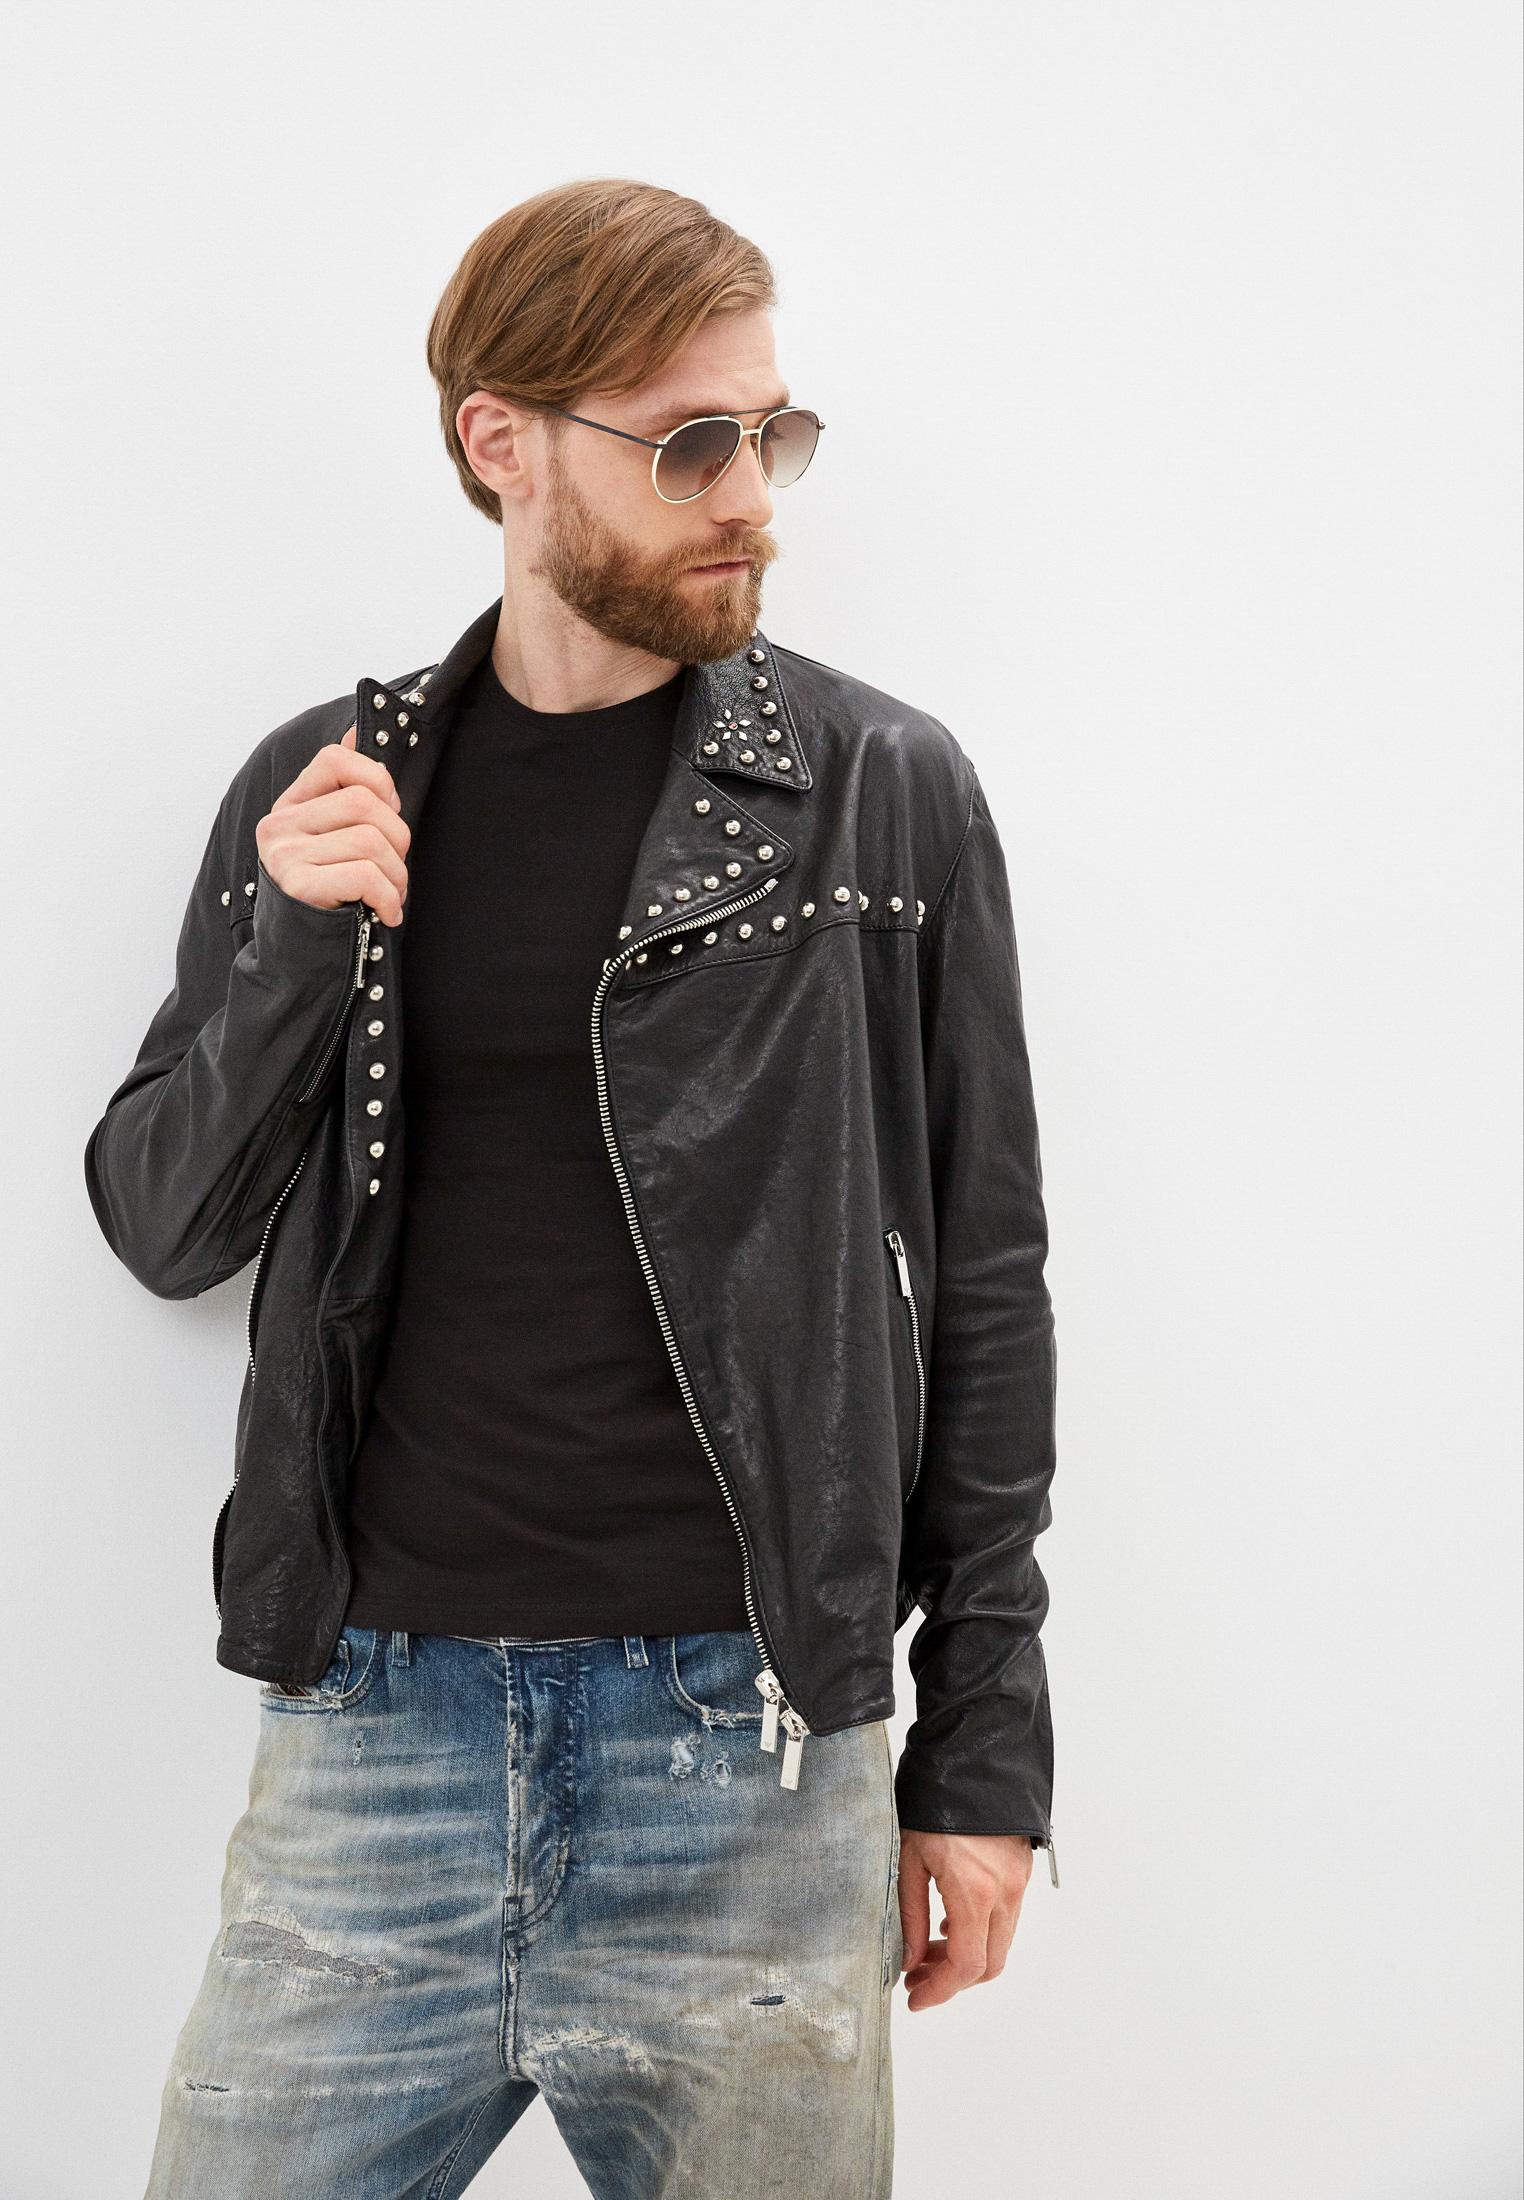 Кожаная куртка Emporio Armani Куртка кожаная Emporio Armani